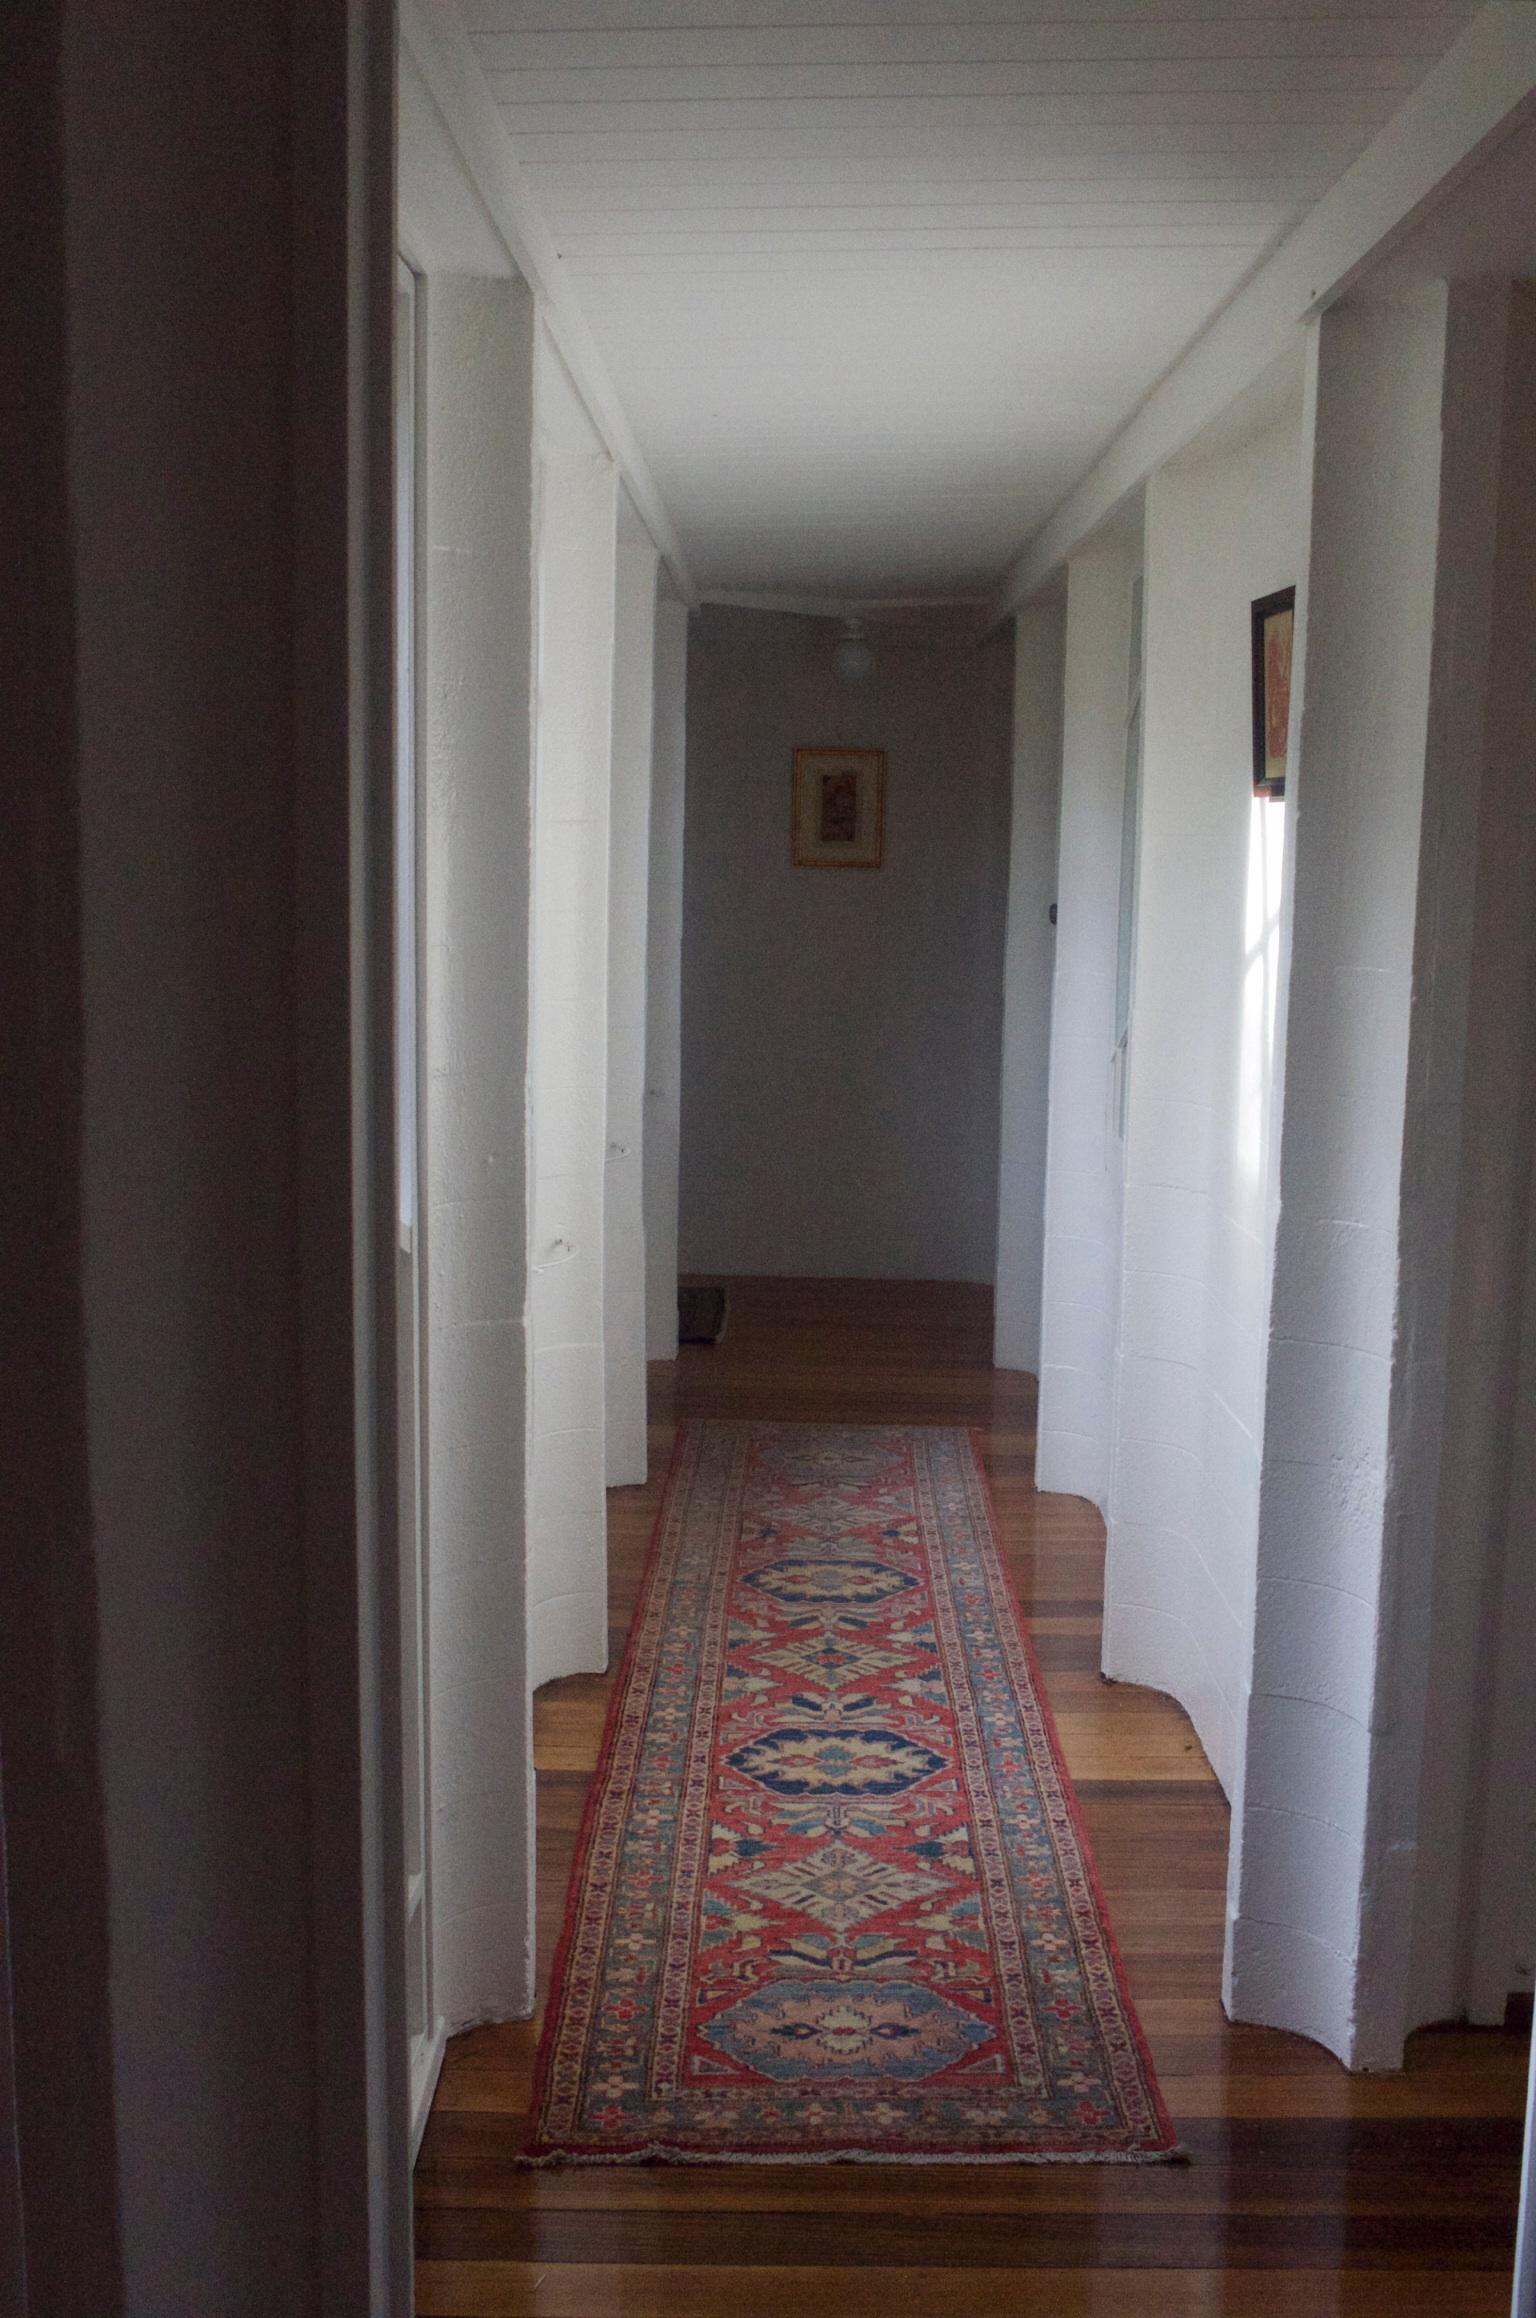 Corridor in the house |House Corridors